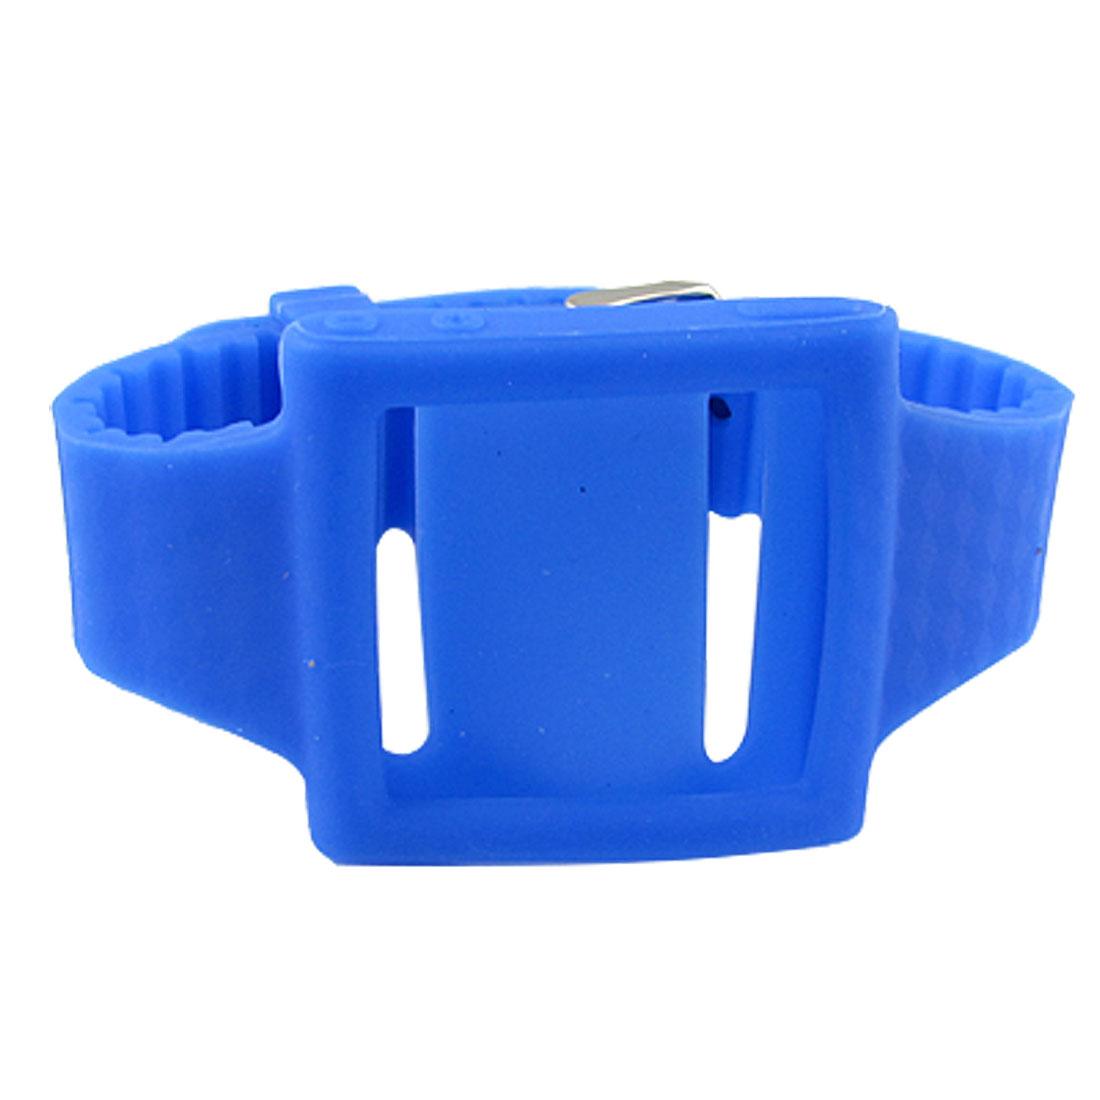 Royalblue Soft Silicone Wrist Band Case for iPod Nano 6